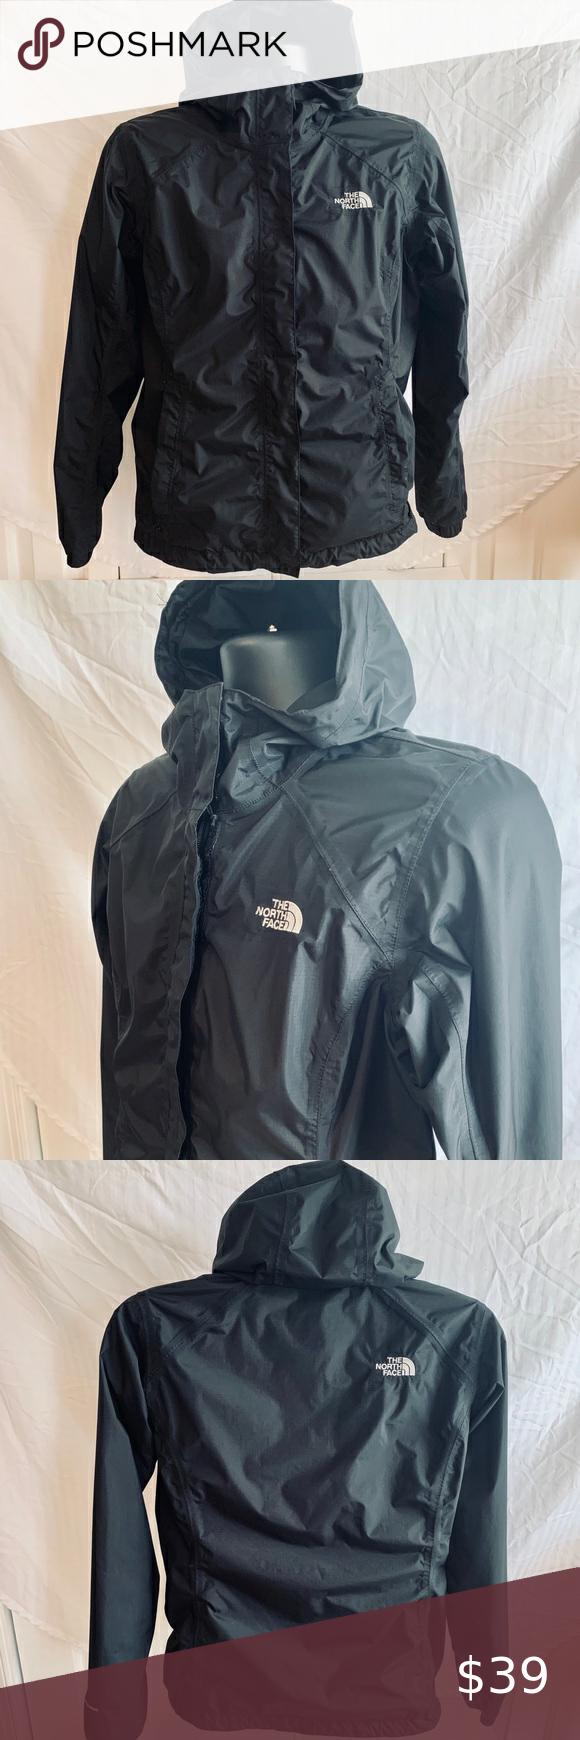 North Face Waterproof Wind Proof Rain Jacket North Face Waterproof Clothes Design The North Face [ 1740 x 580 Pixel ]